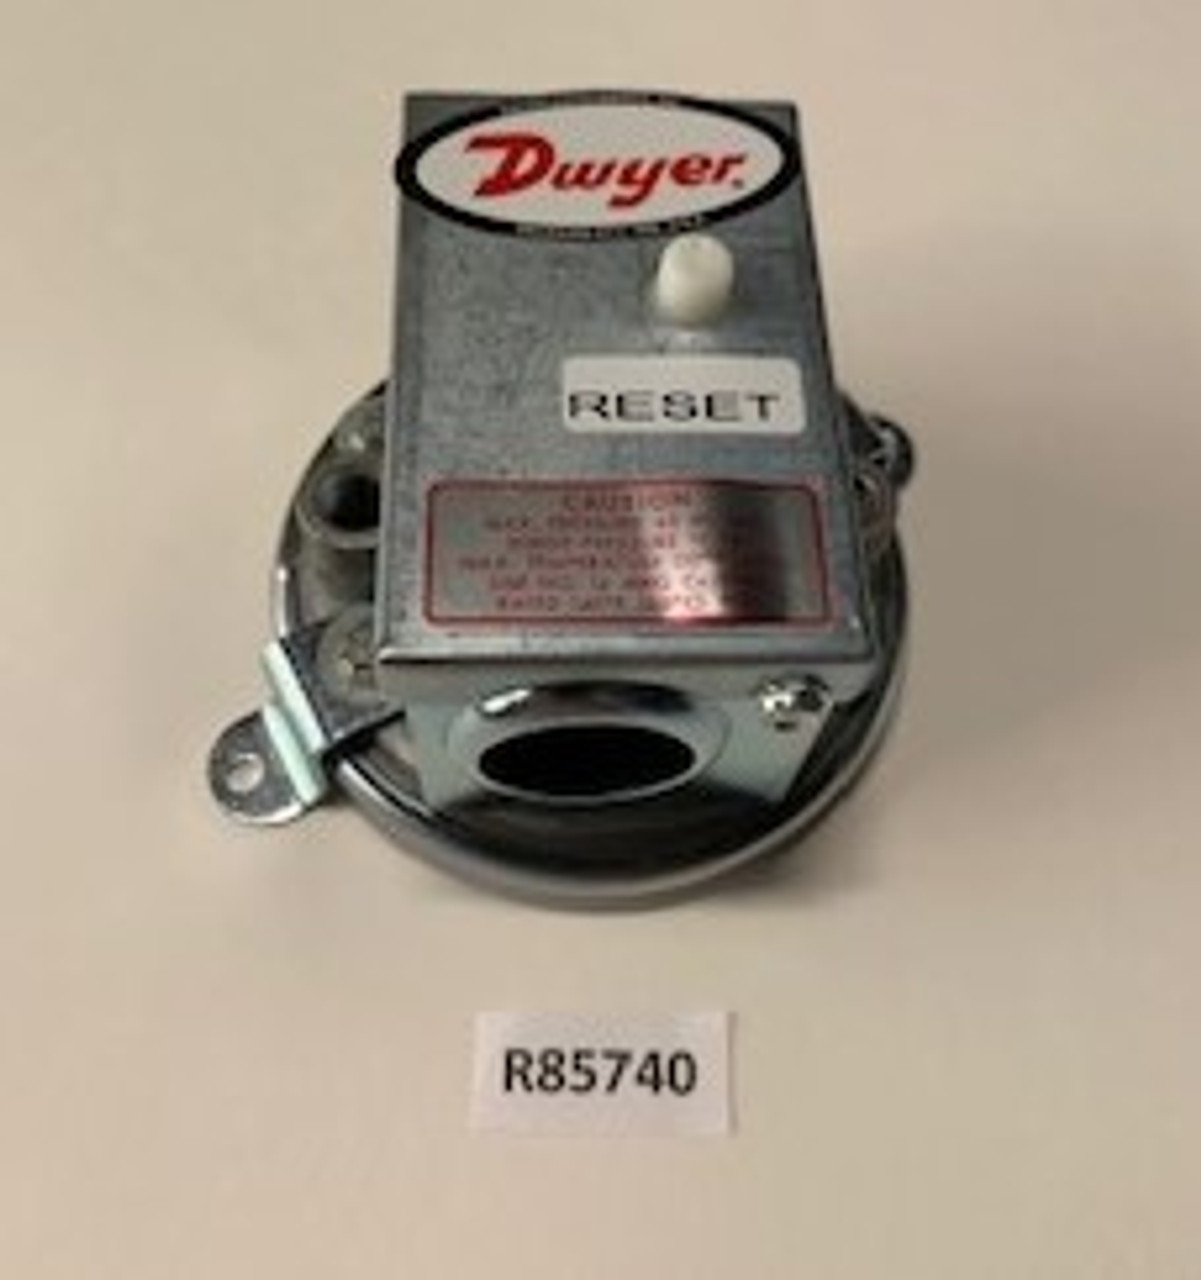 Switch, DPS 1.40-5.50WC Dwyer 1900-5-MR, Aaon, R85740